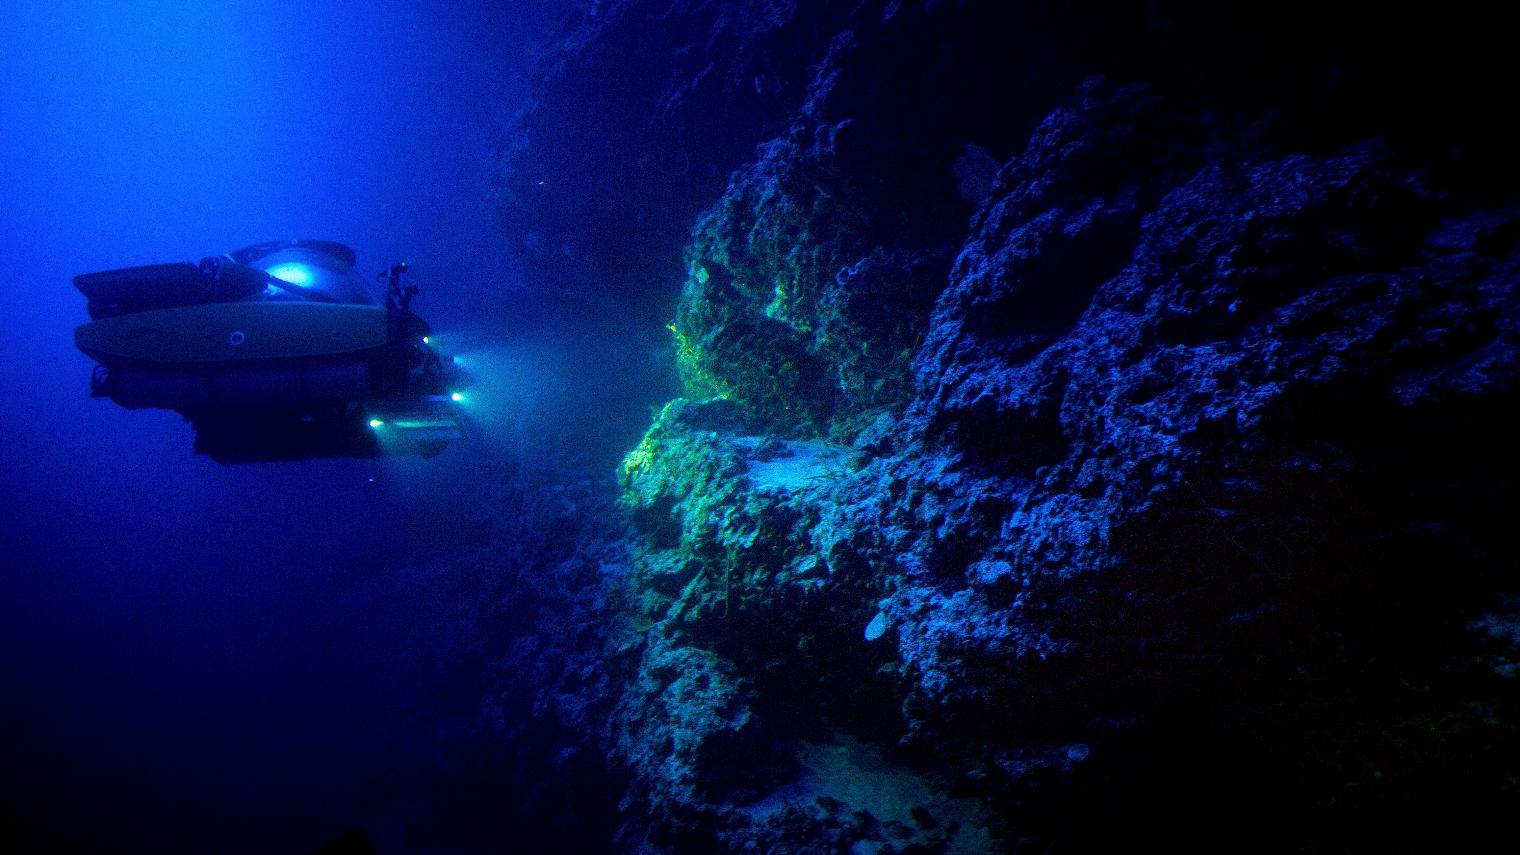 The Nadir sub surveys the underwater terrain of Exuma Sound, Bahamas.